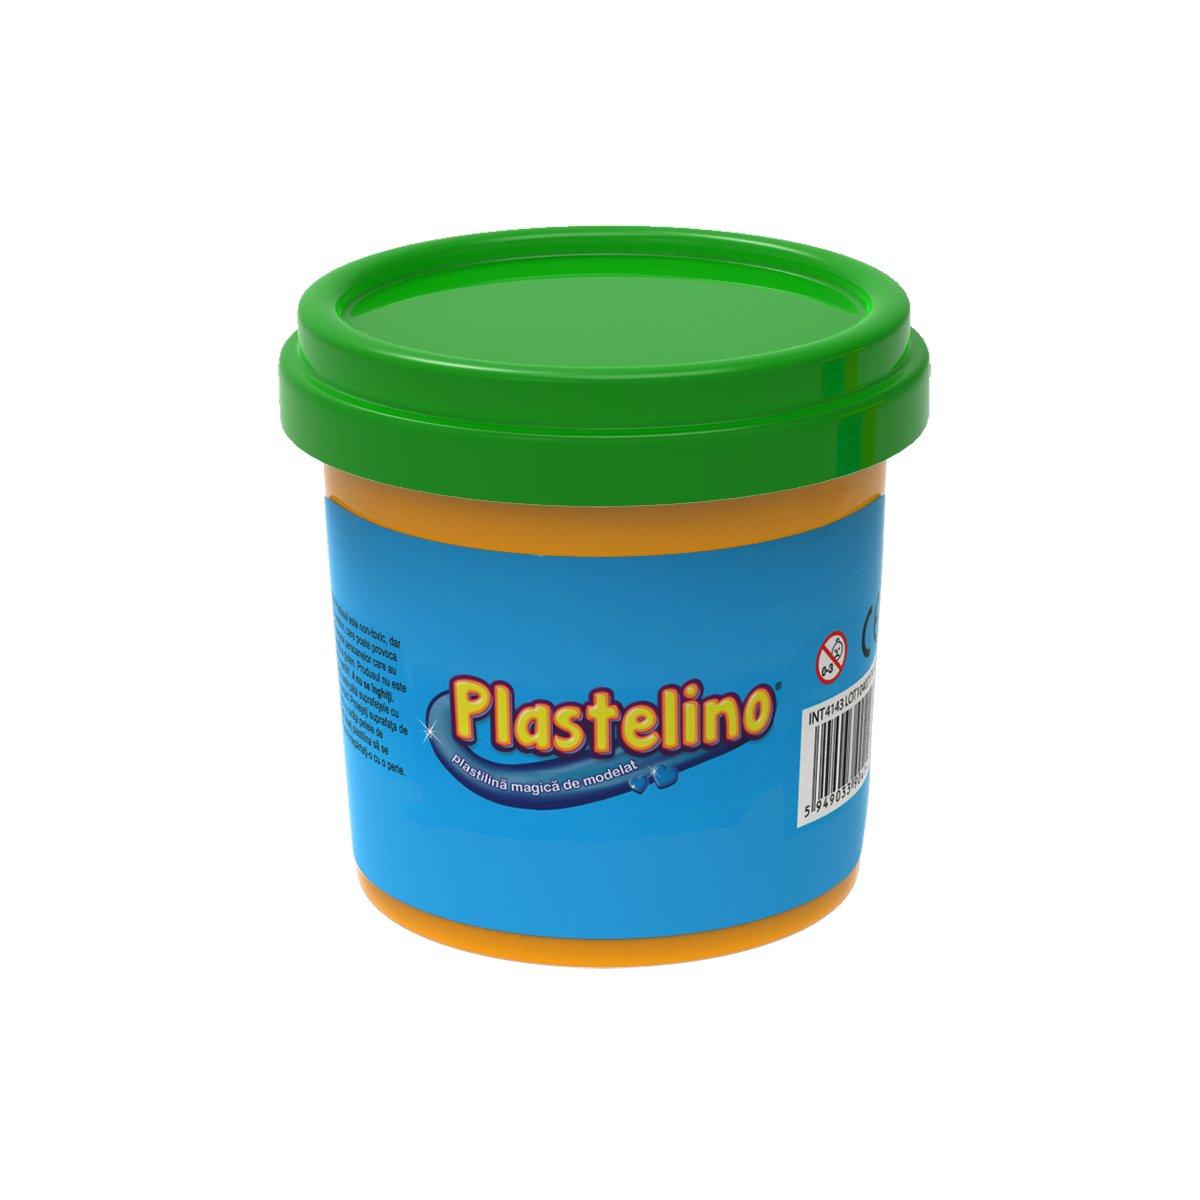 Plastelino - Tub de plastilina, Verde imagine